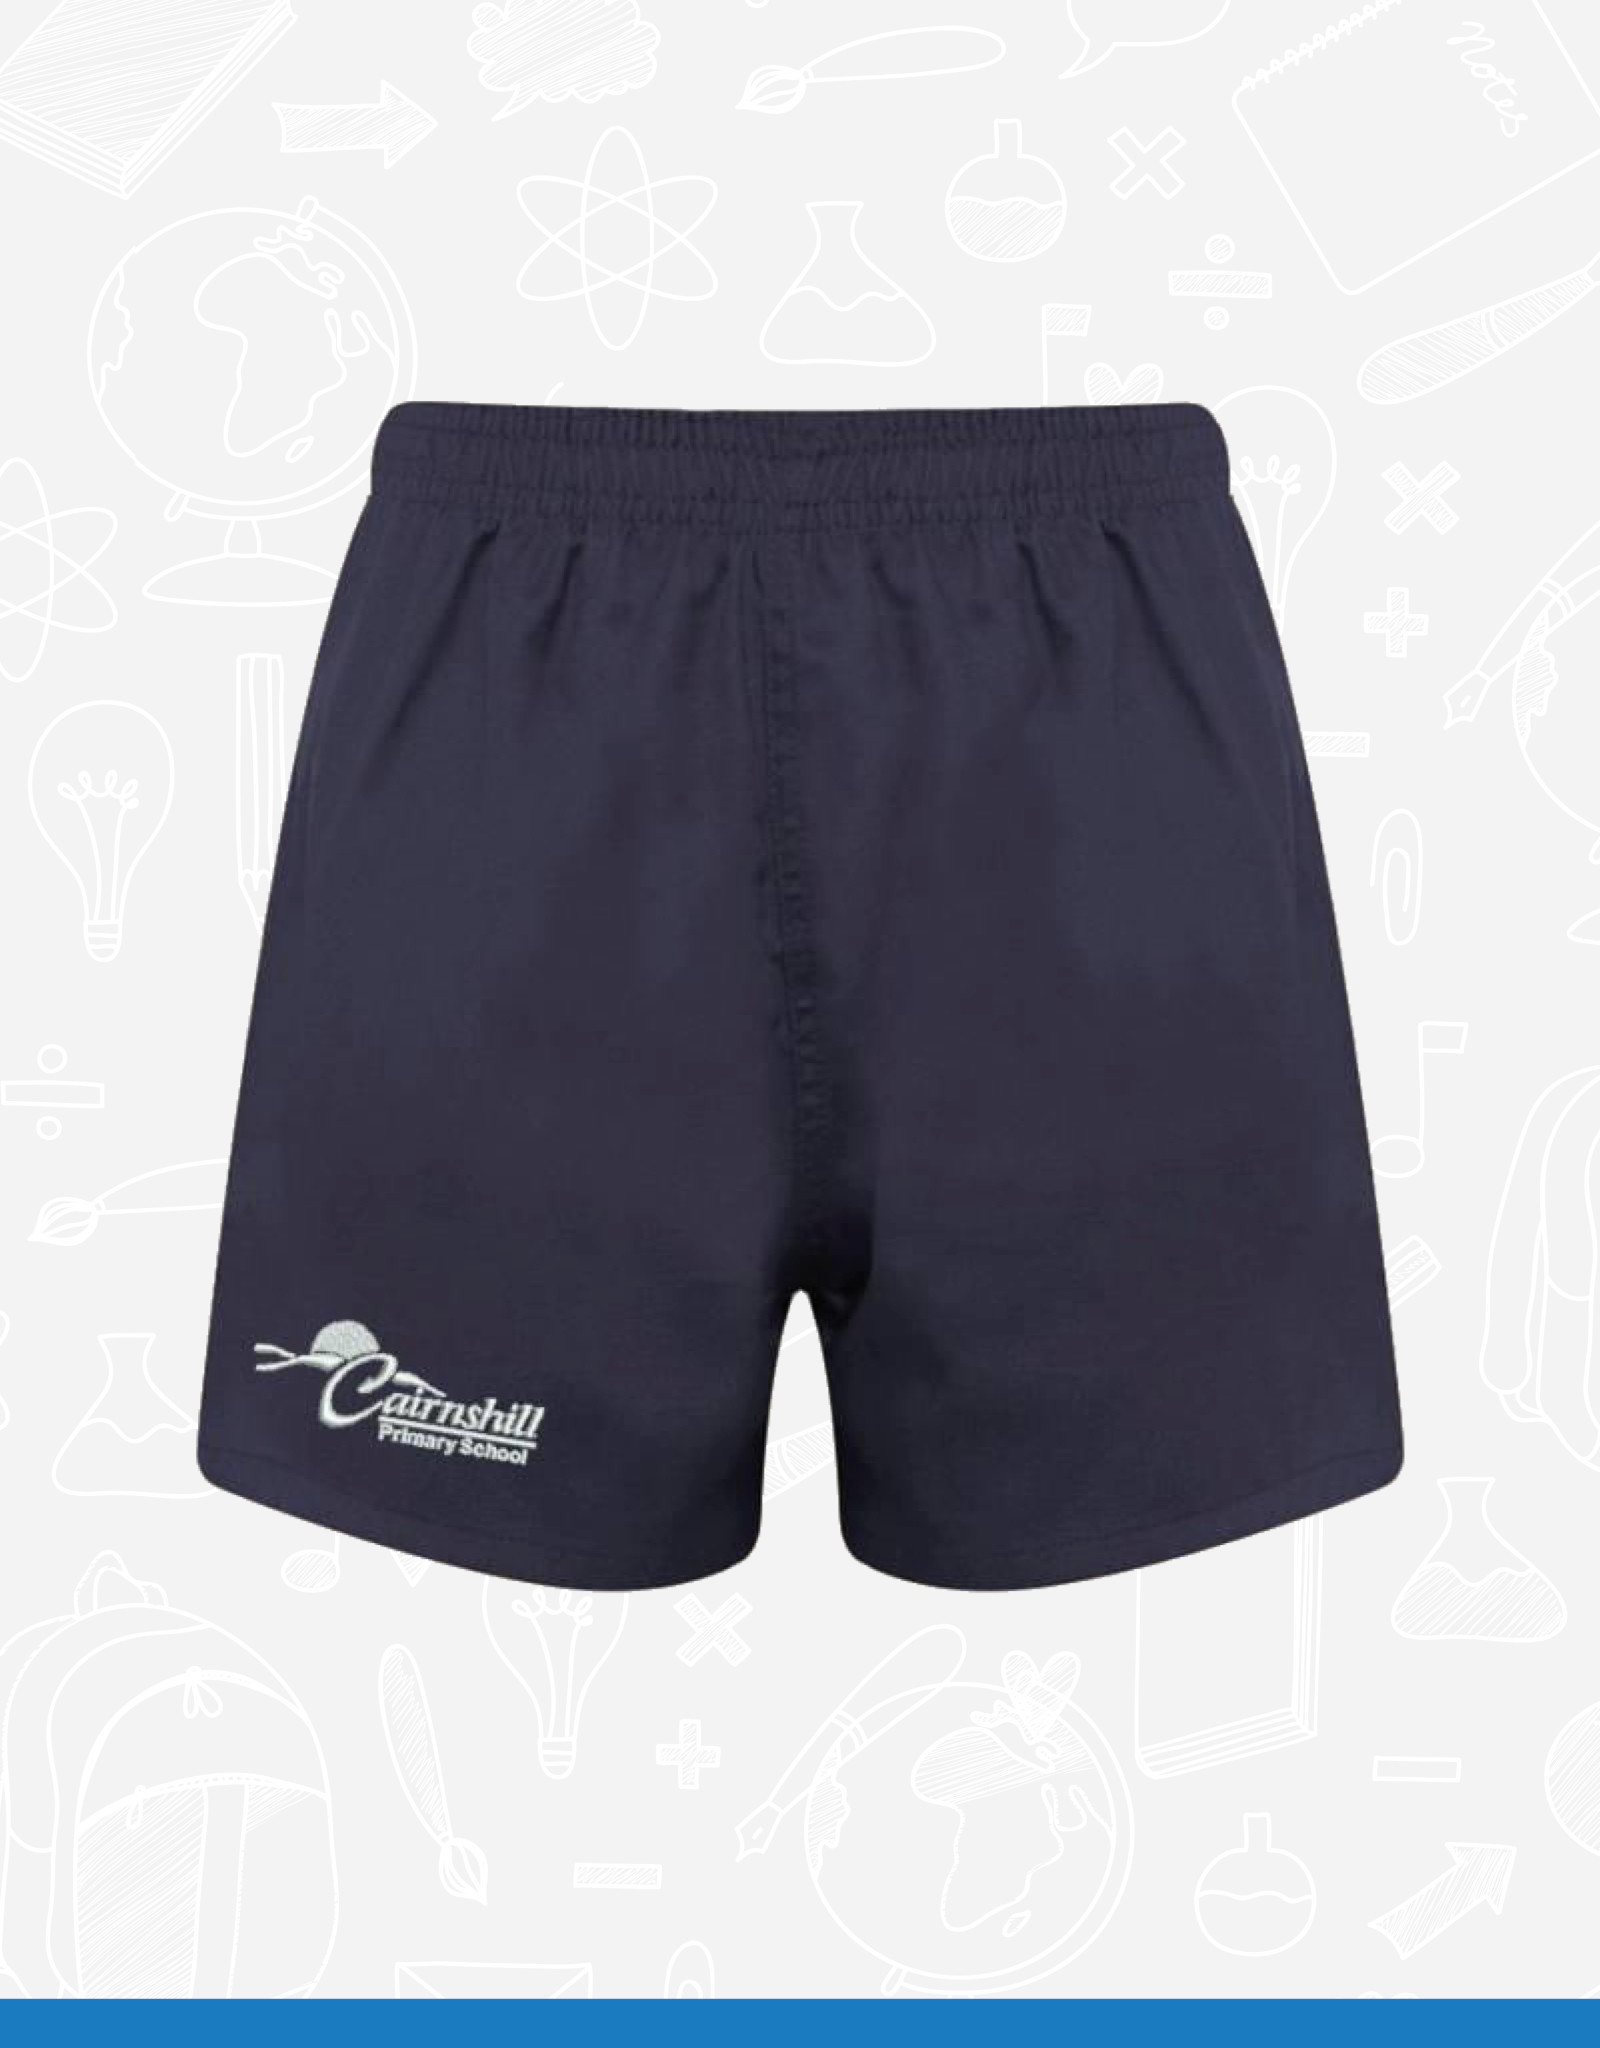 Aptus Cairnshill Primary PE Shorts (112318)